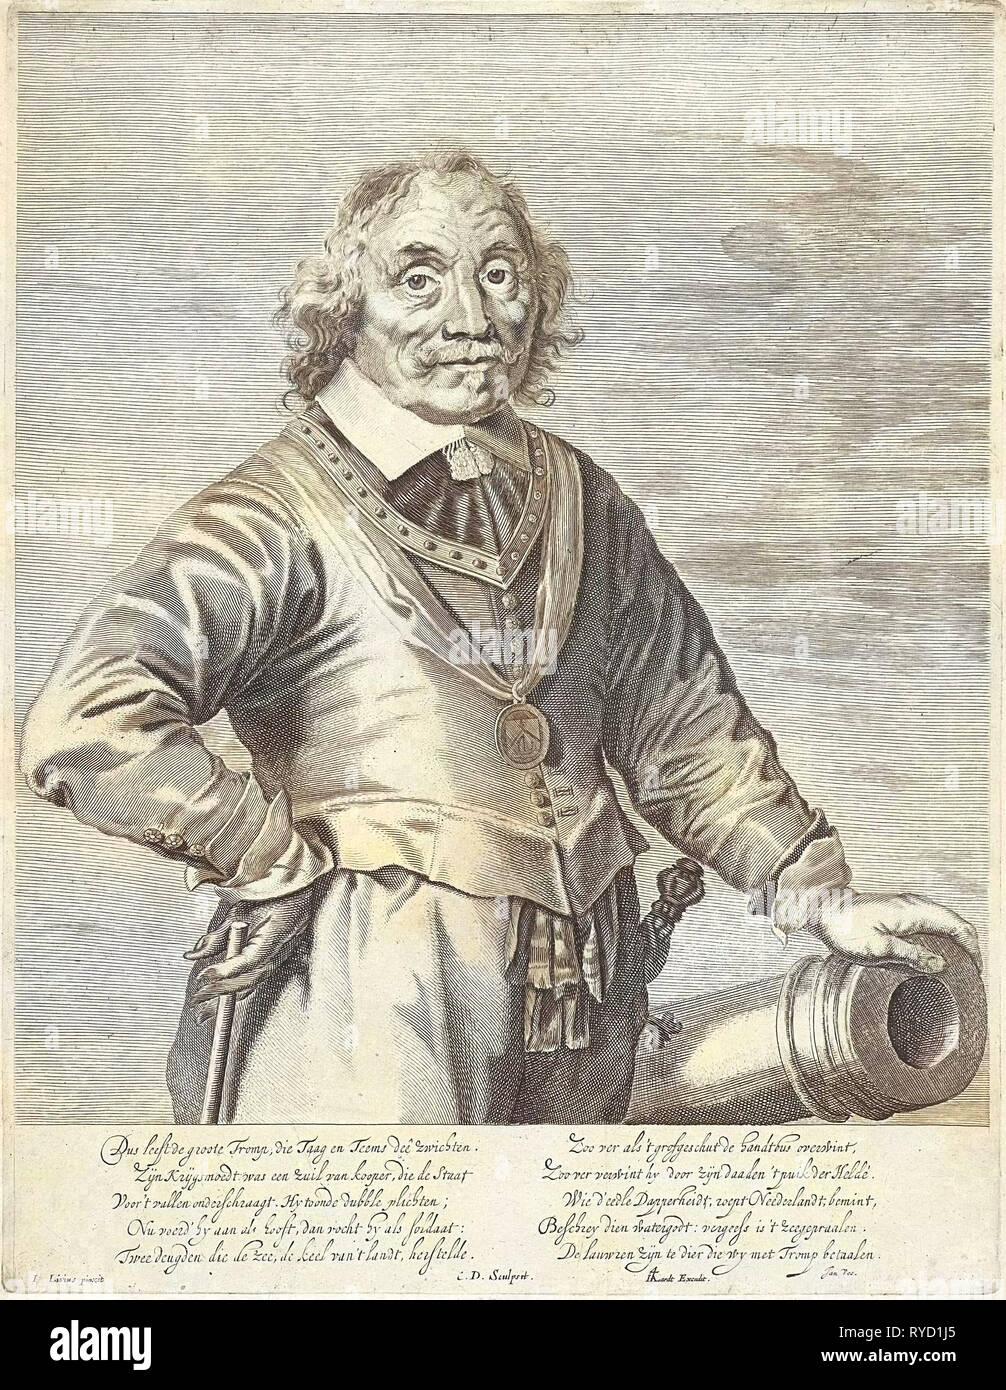 Portrait of Maarten Tromp Harpertsz, Anonymous, Allard, Jan Vos, 1648 - 1664 Stock Photo